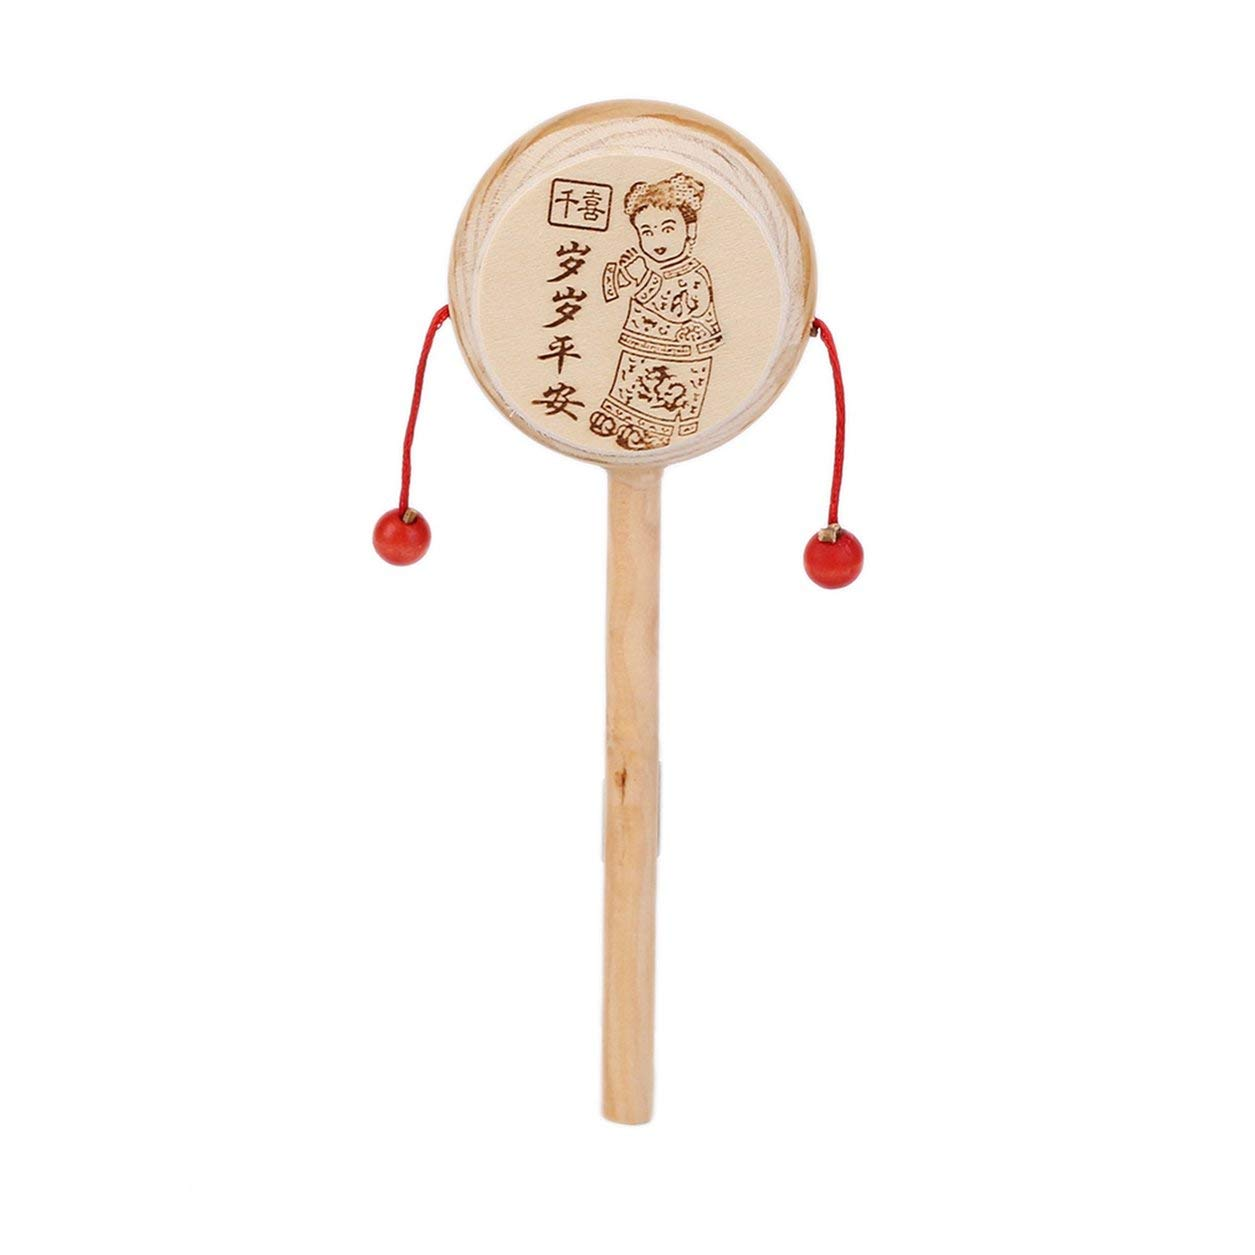 Dailyinshop Baby-Kind-Kind-Holz Rattle Trommel Instrument Kind Spieluhr Chinese Styles